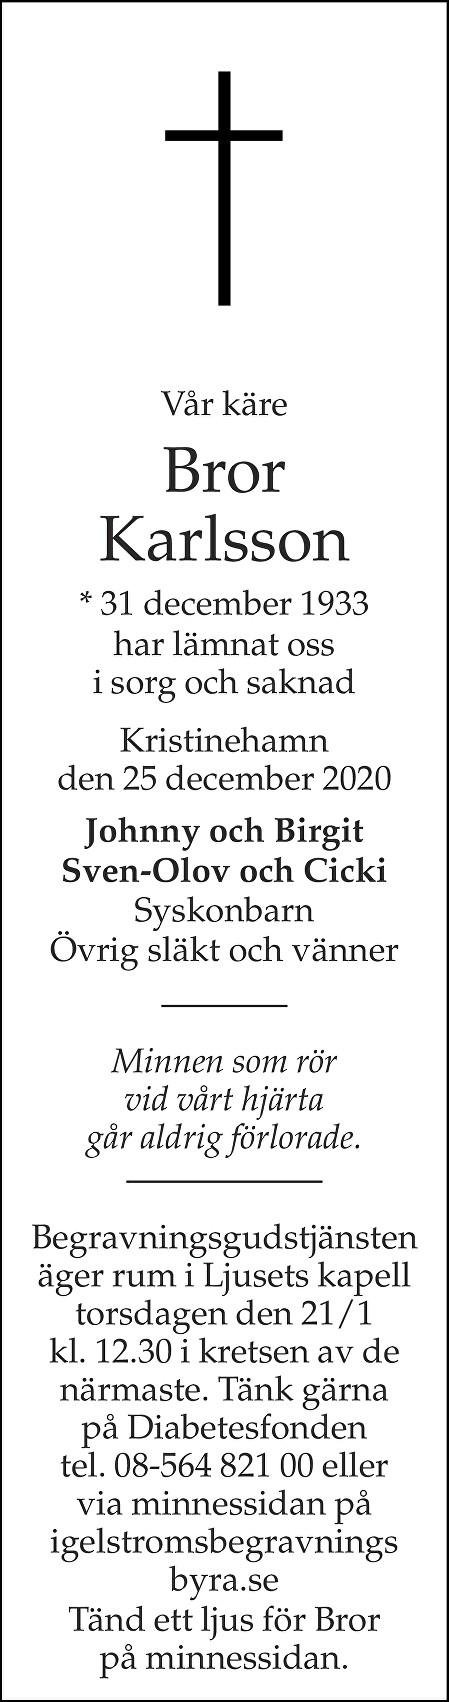 Bror Karlsson Death notice